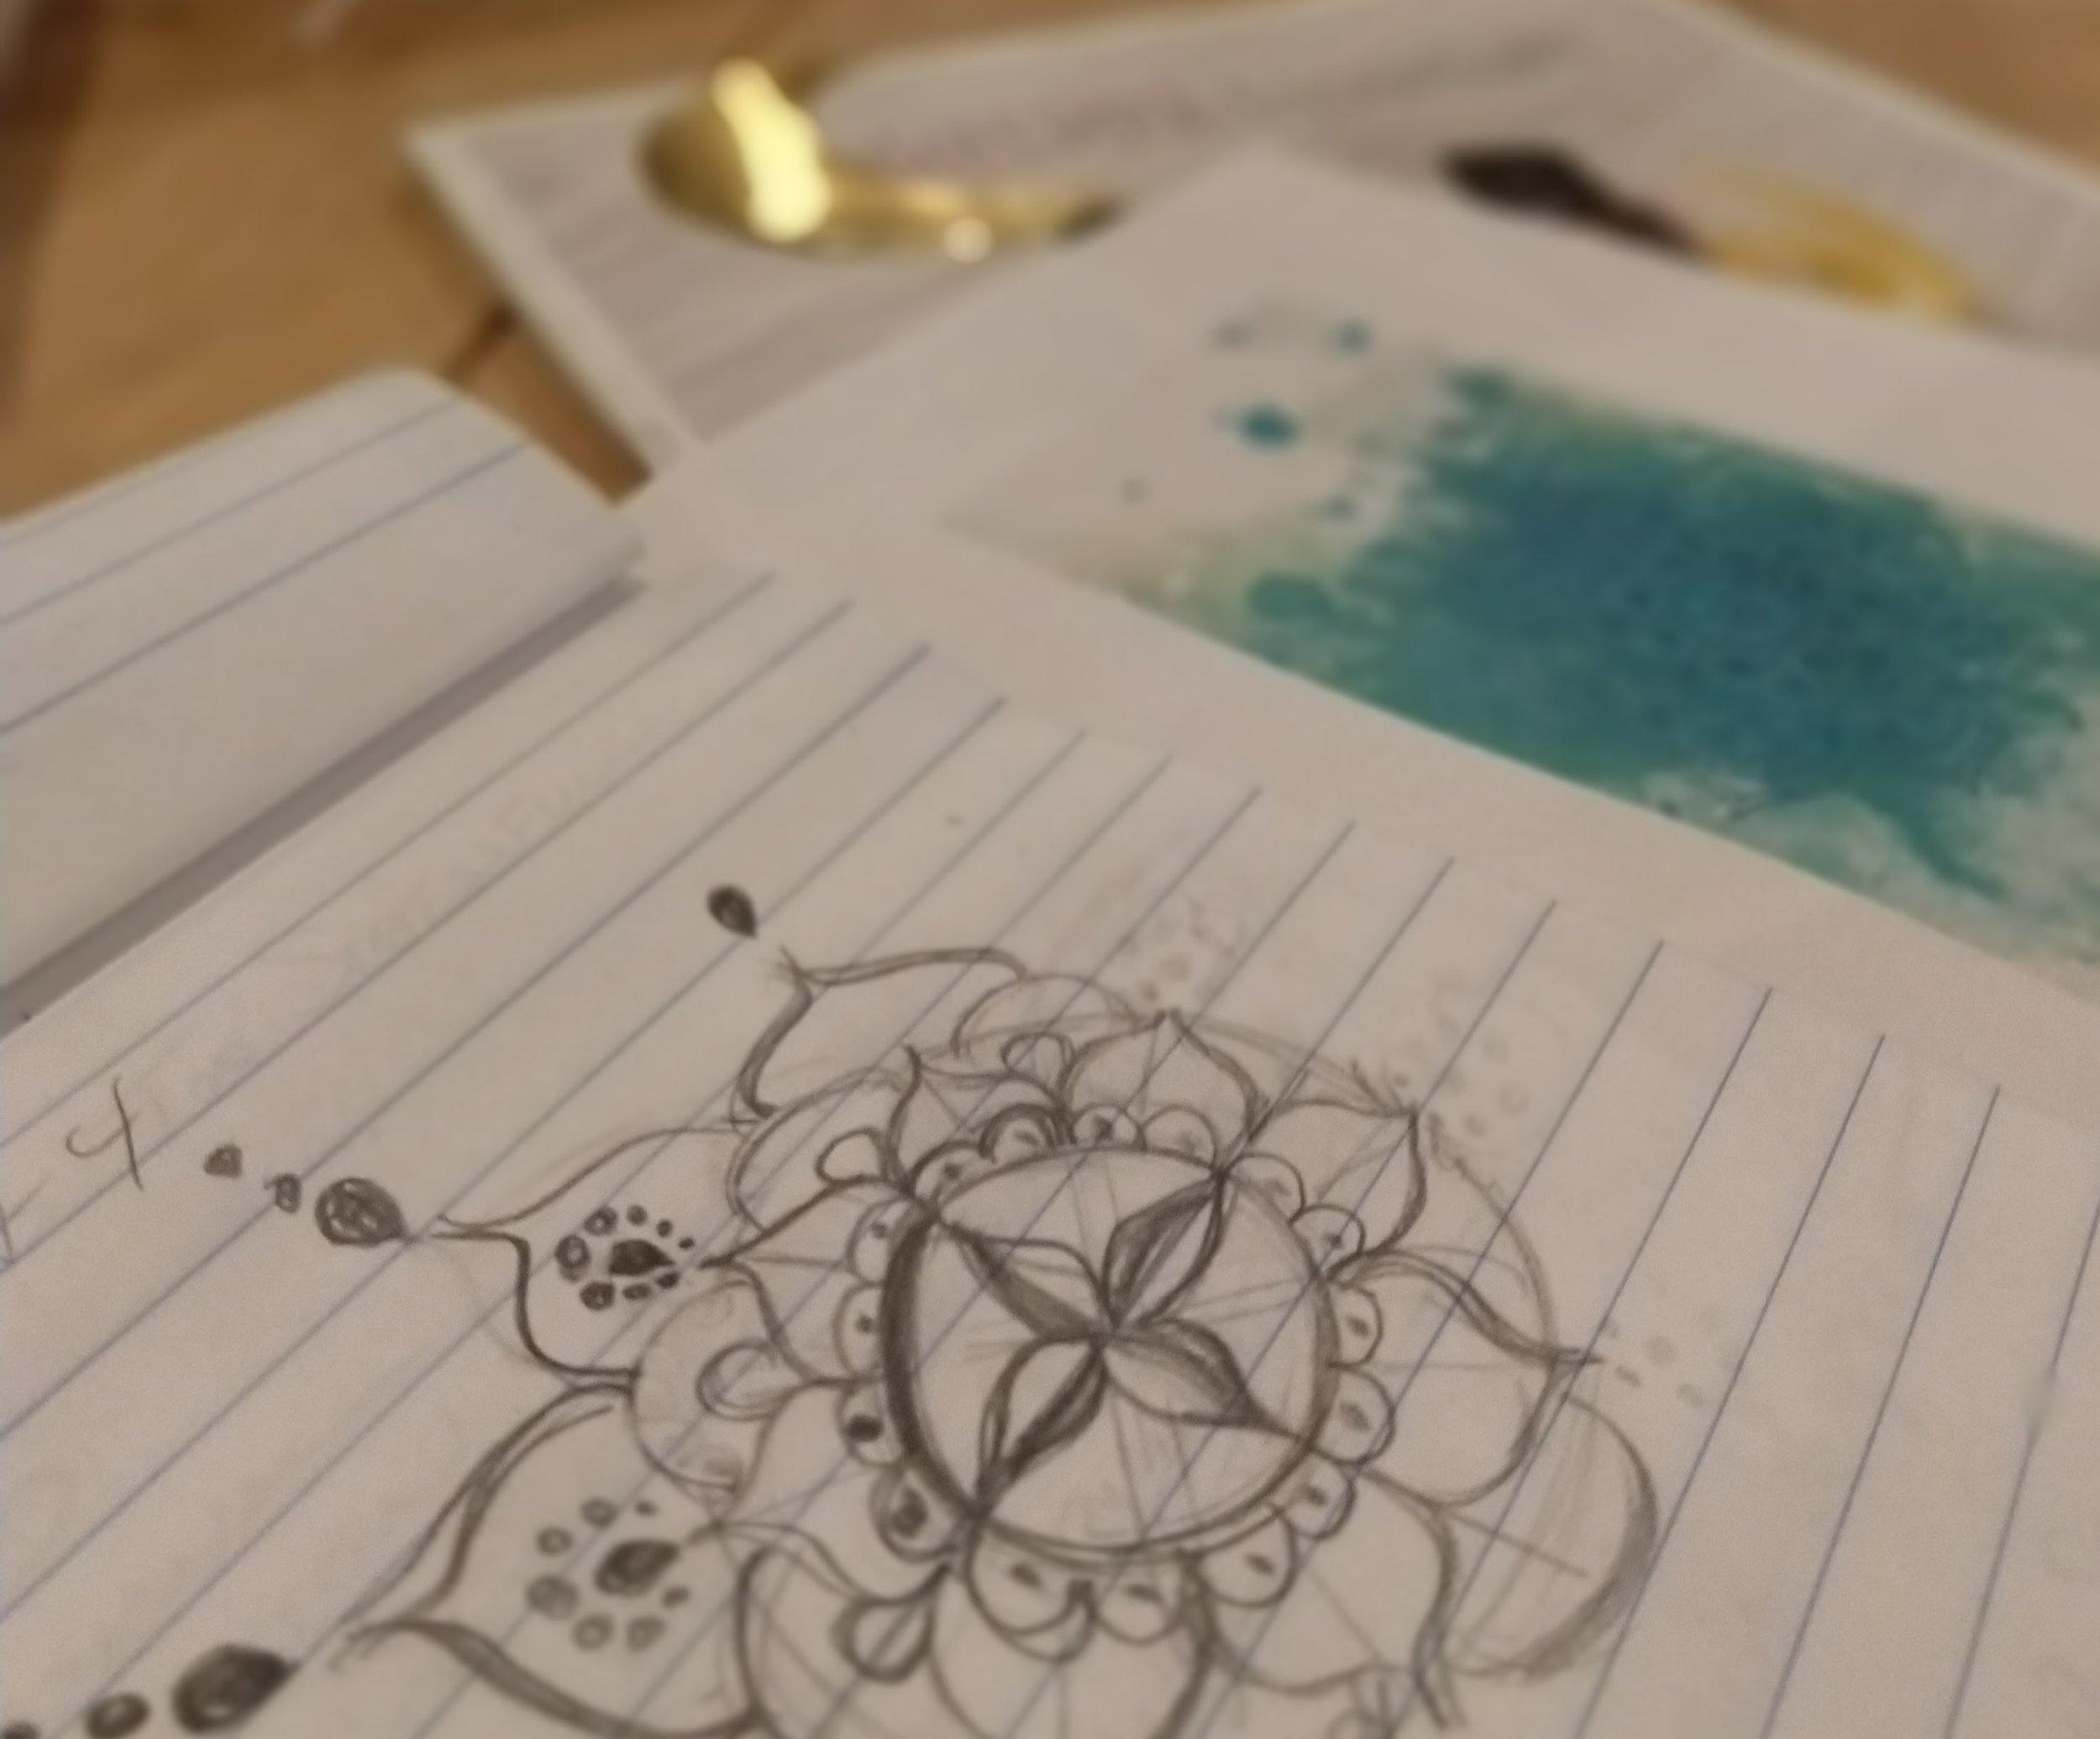 Design: Mandala - Theme: Uplifting